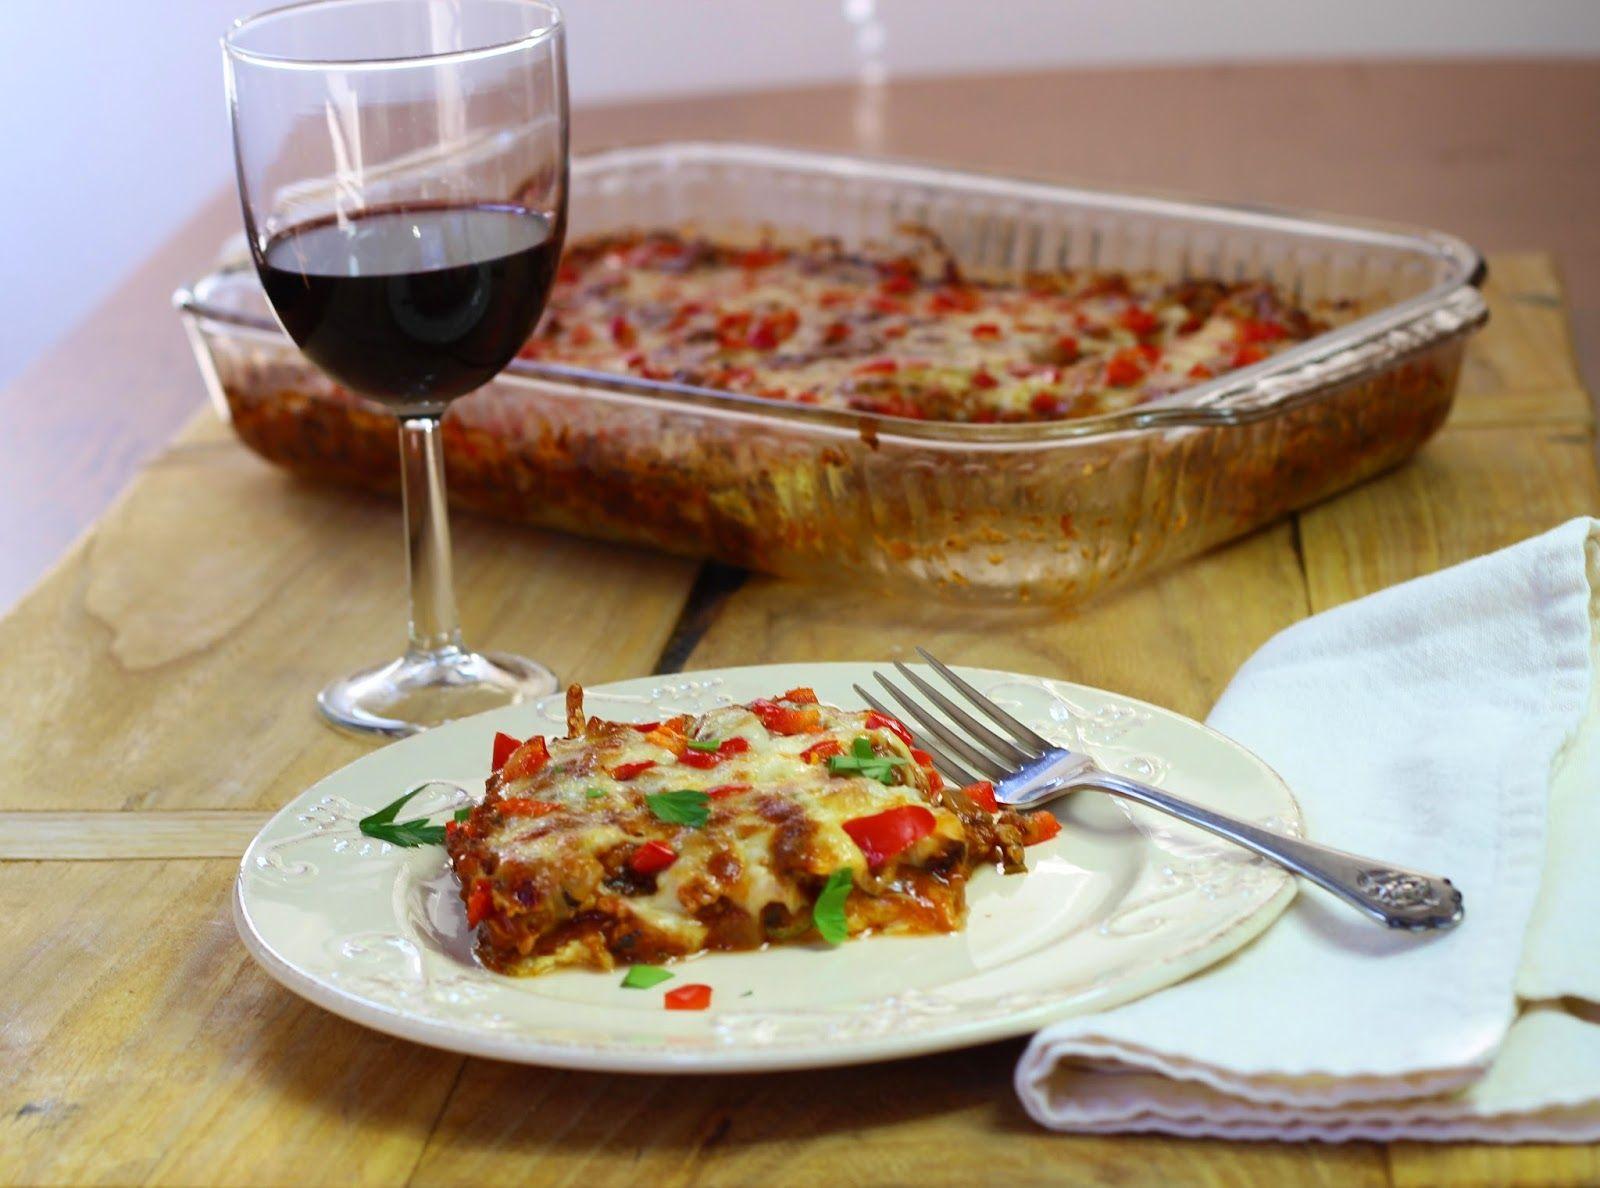 Burp!: Pizza Casserole with Zucchini Crust